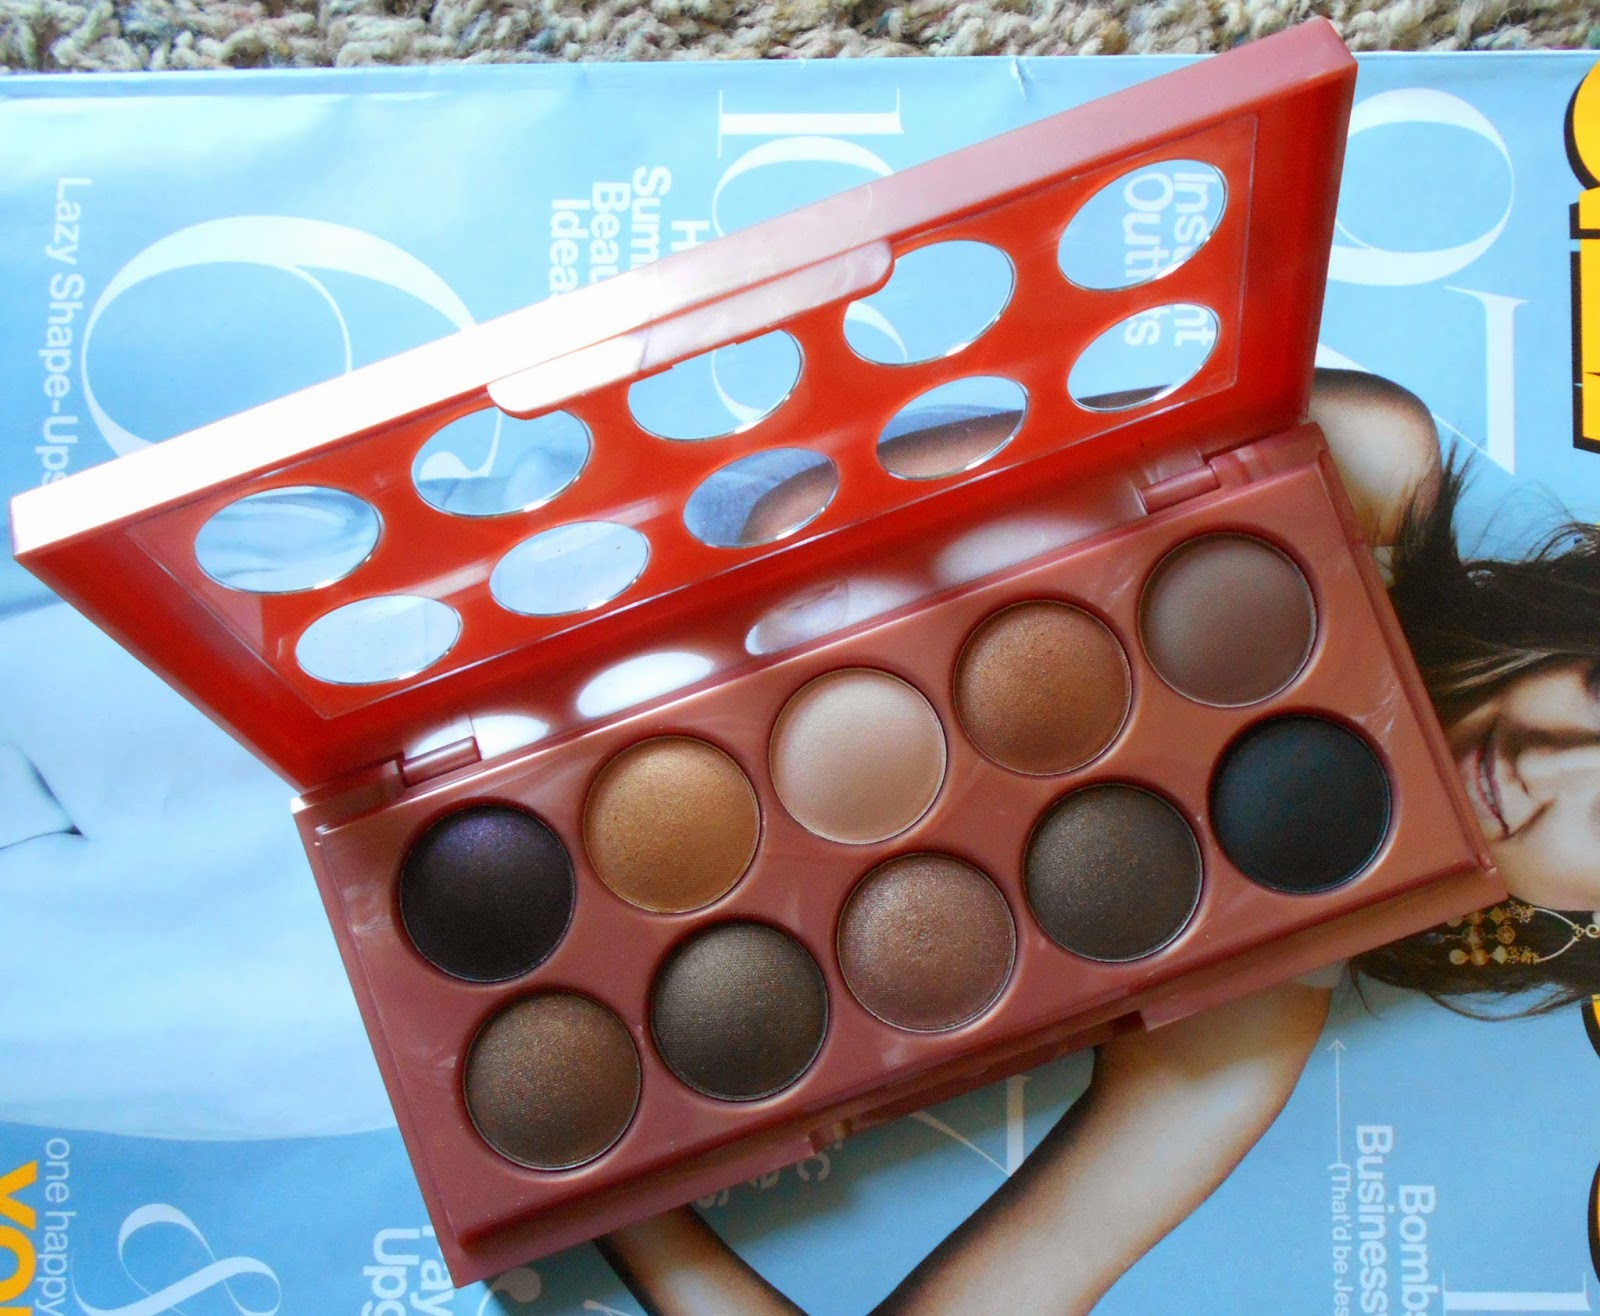 NYX Cosmetics Dream Catcher Palette in Dusk Til Dawn